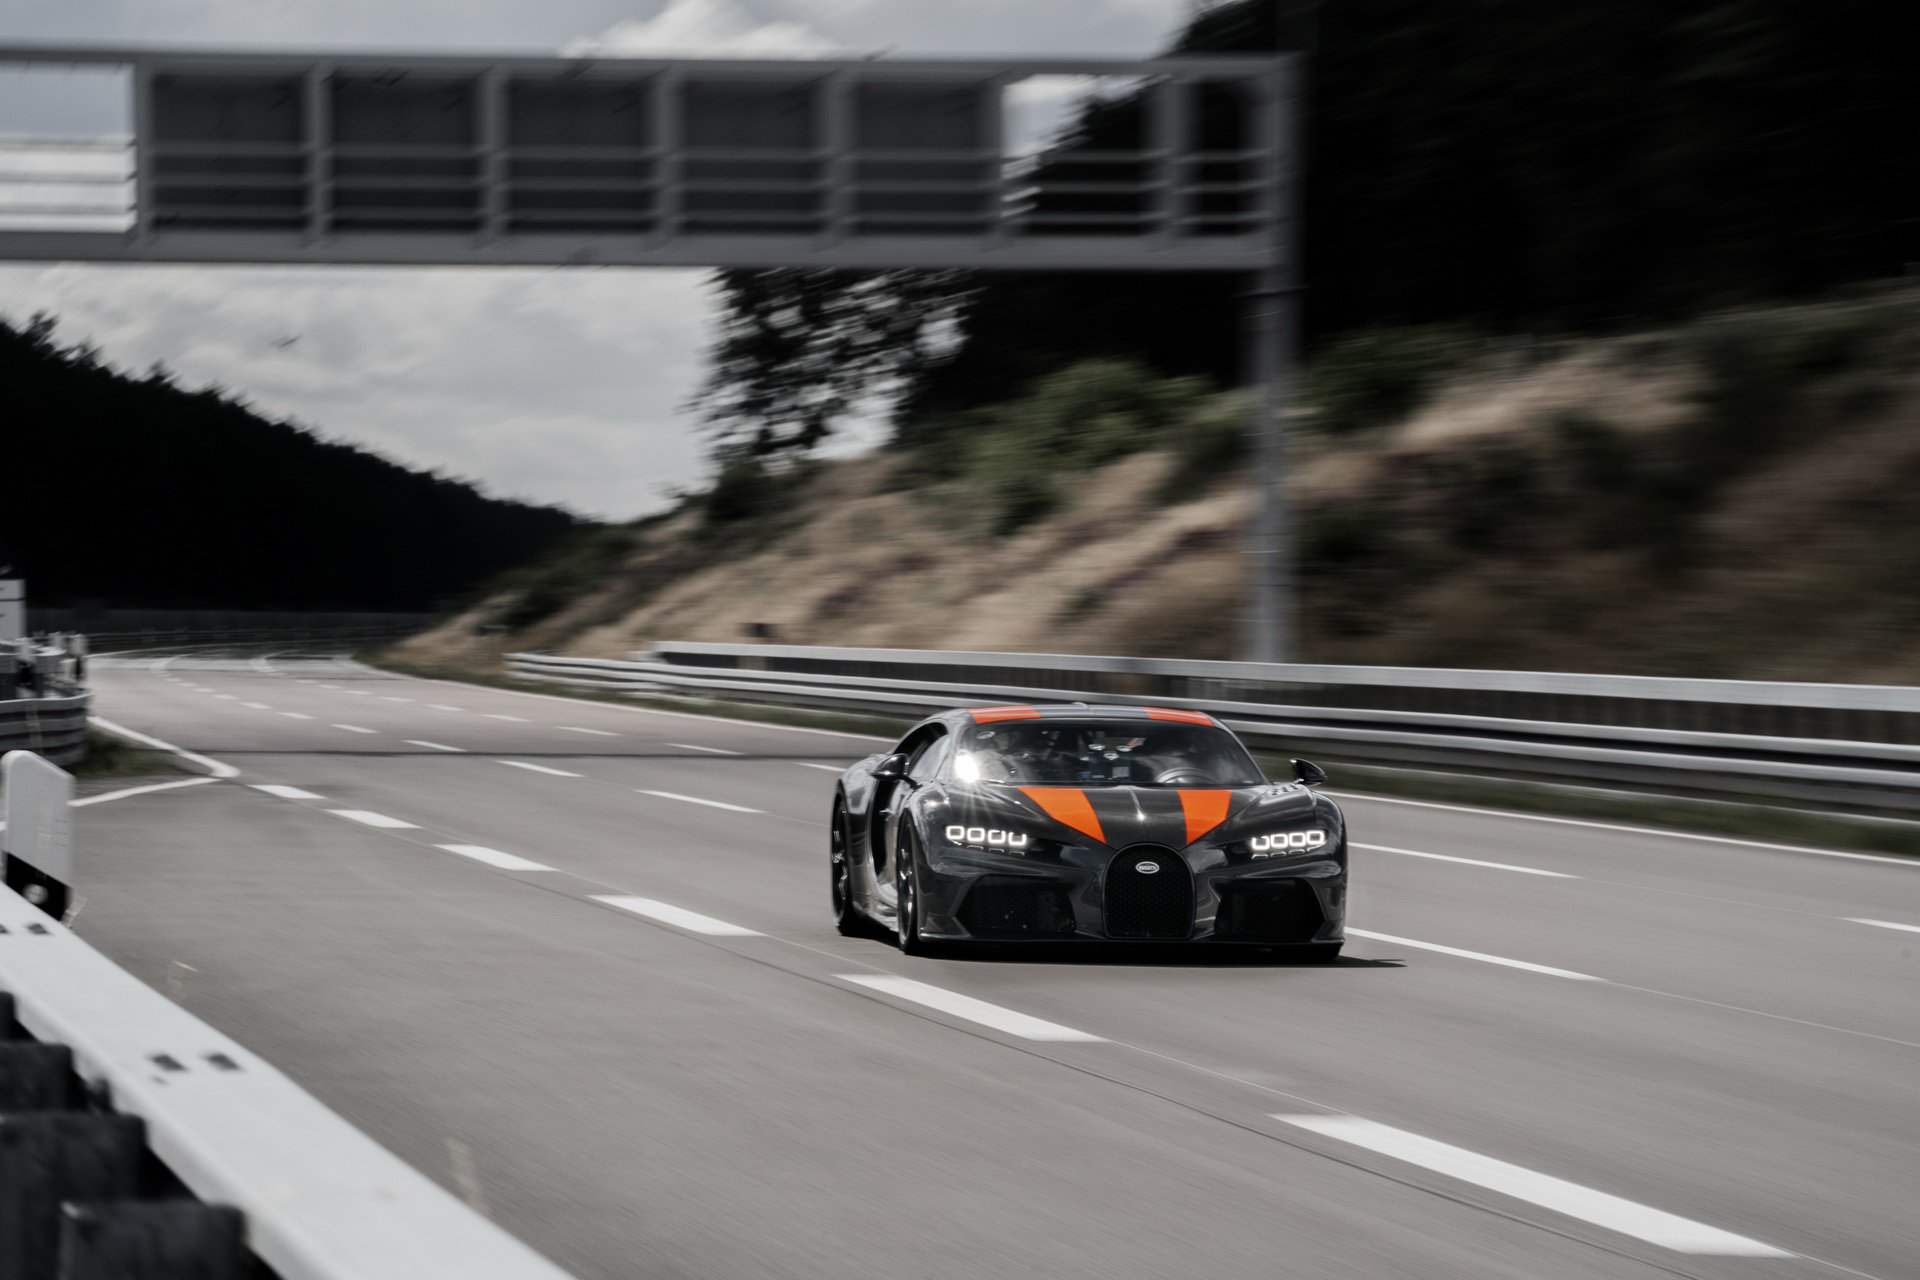 bugatti-chiron-topspeedrun-01.jpg